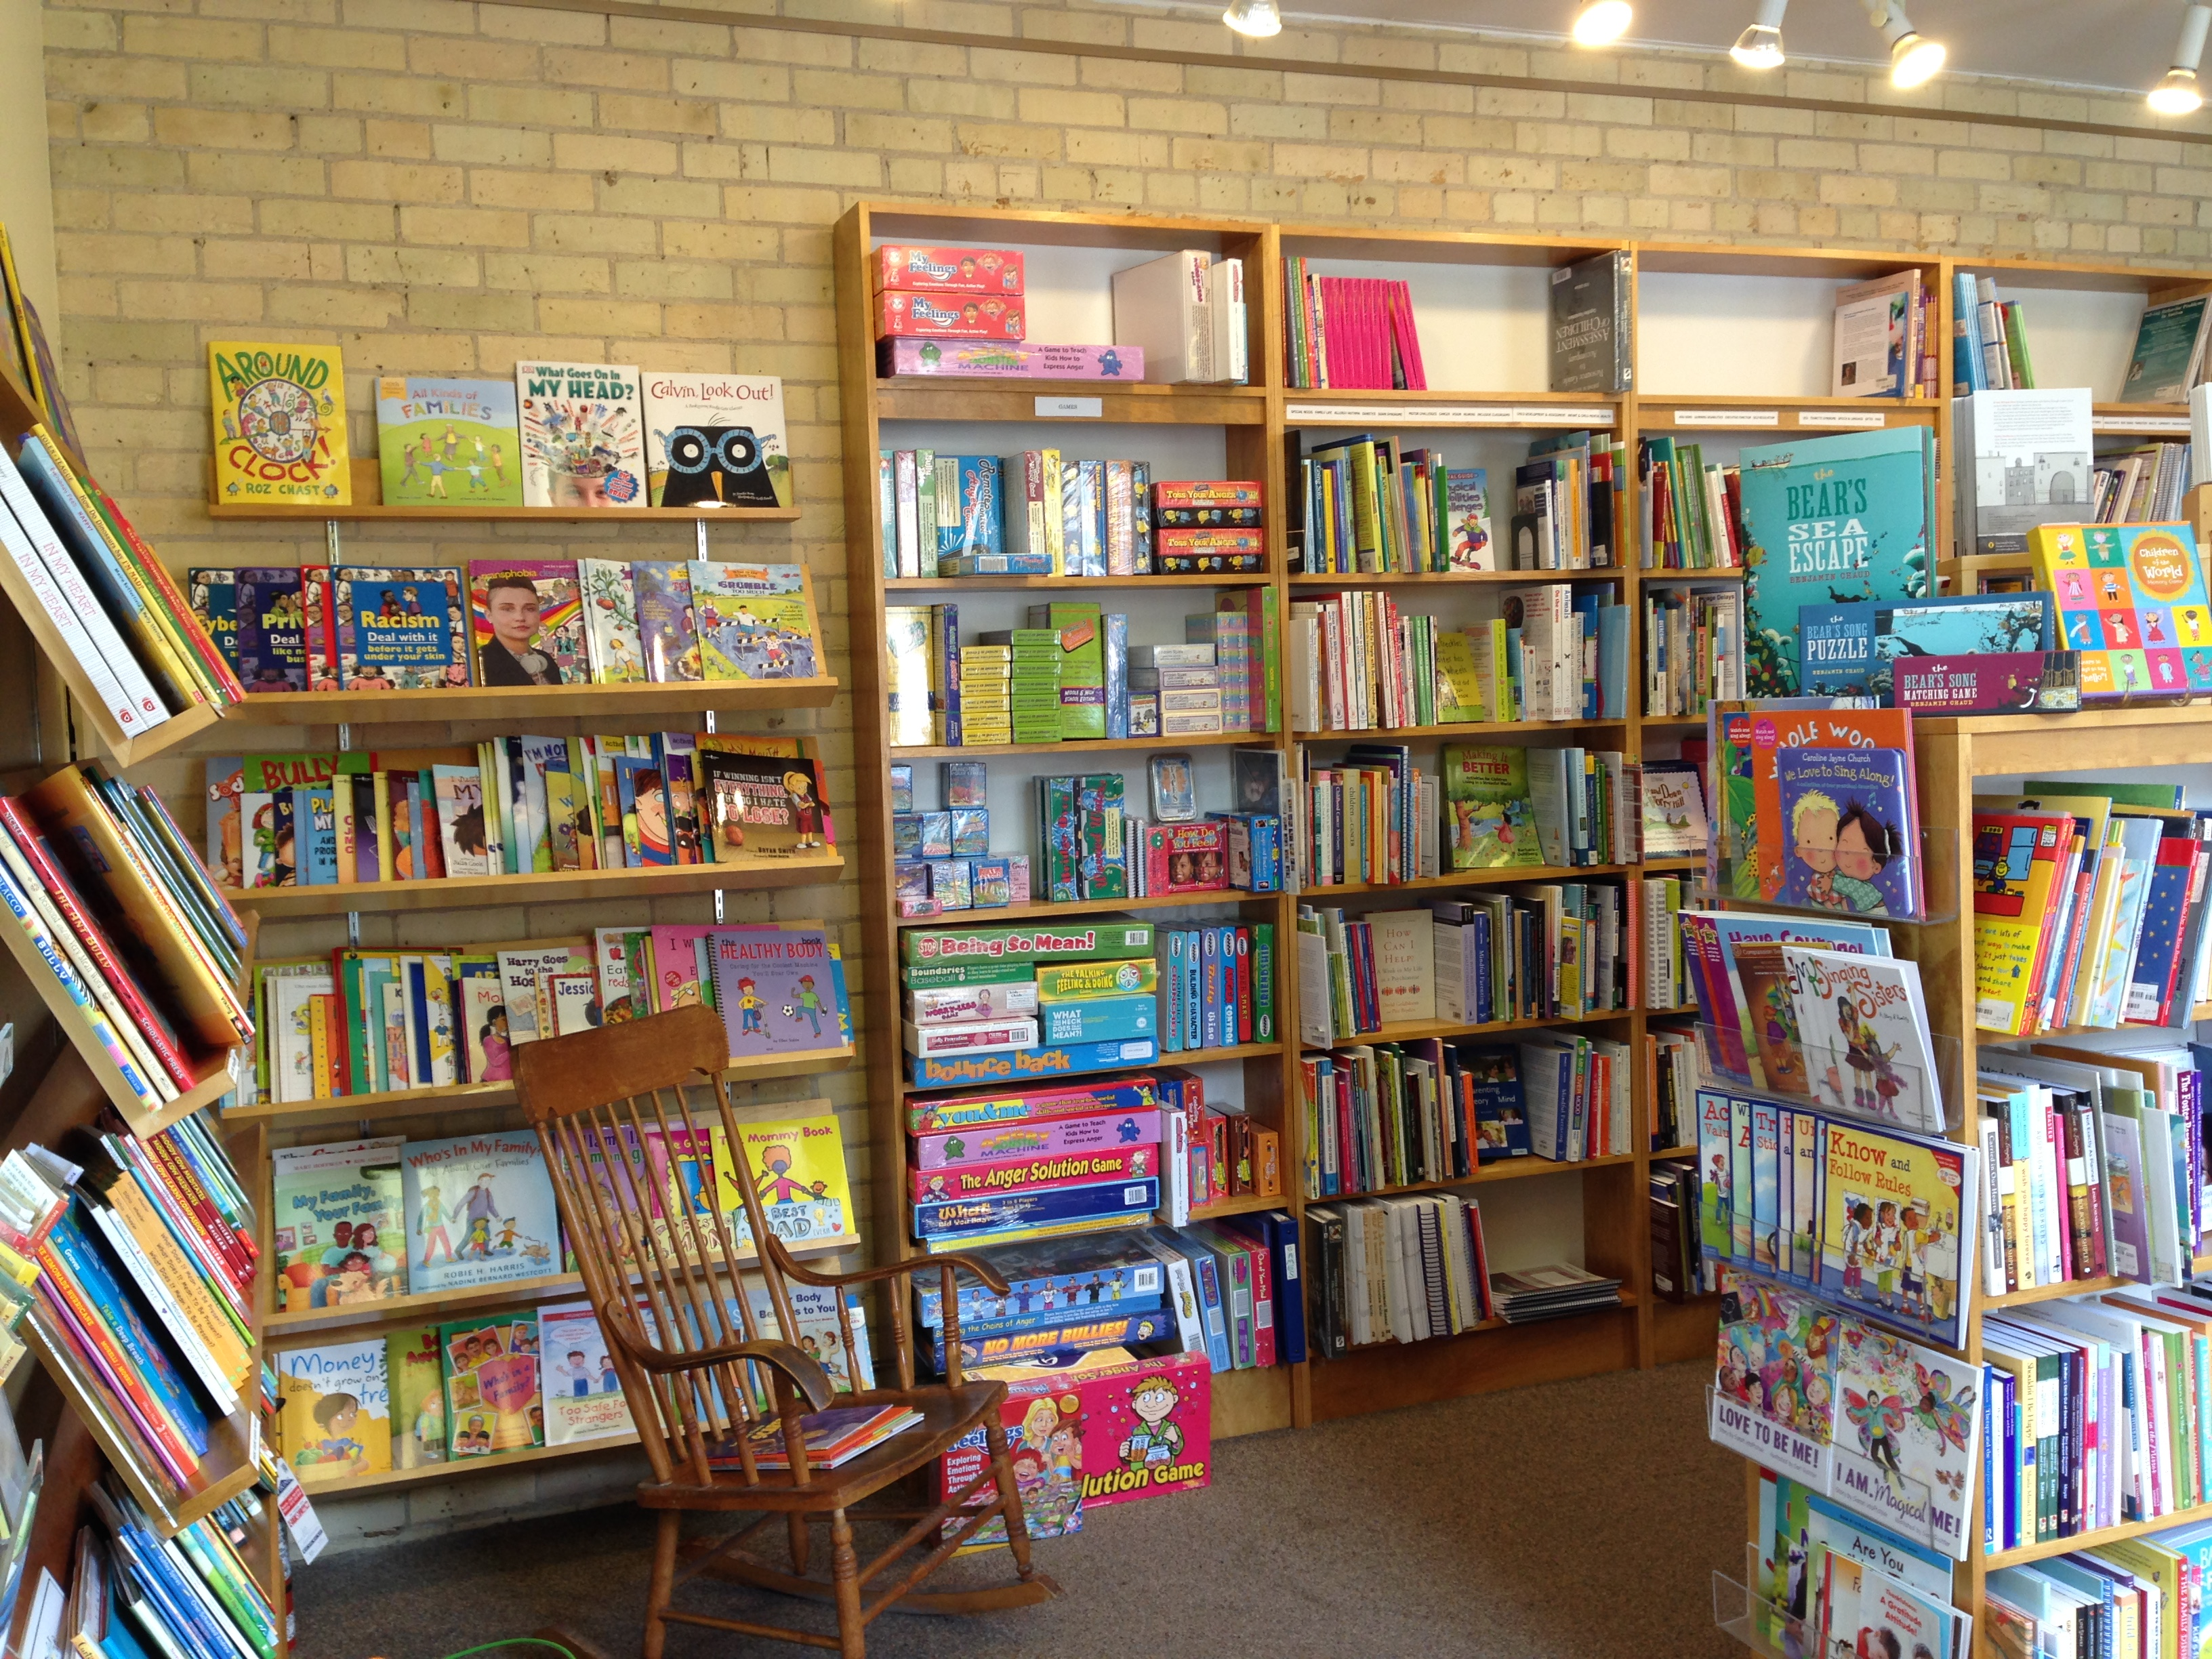 Parentbooks children's corner